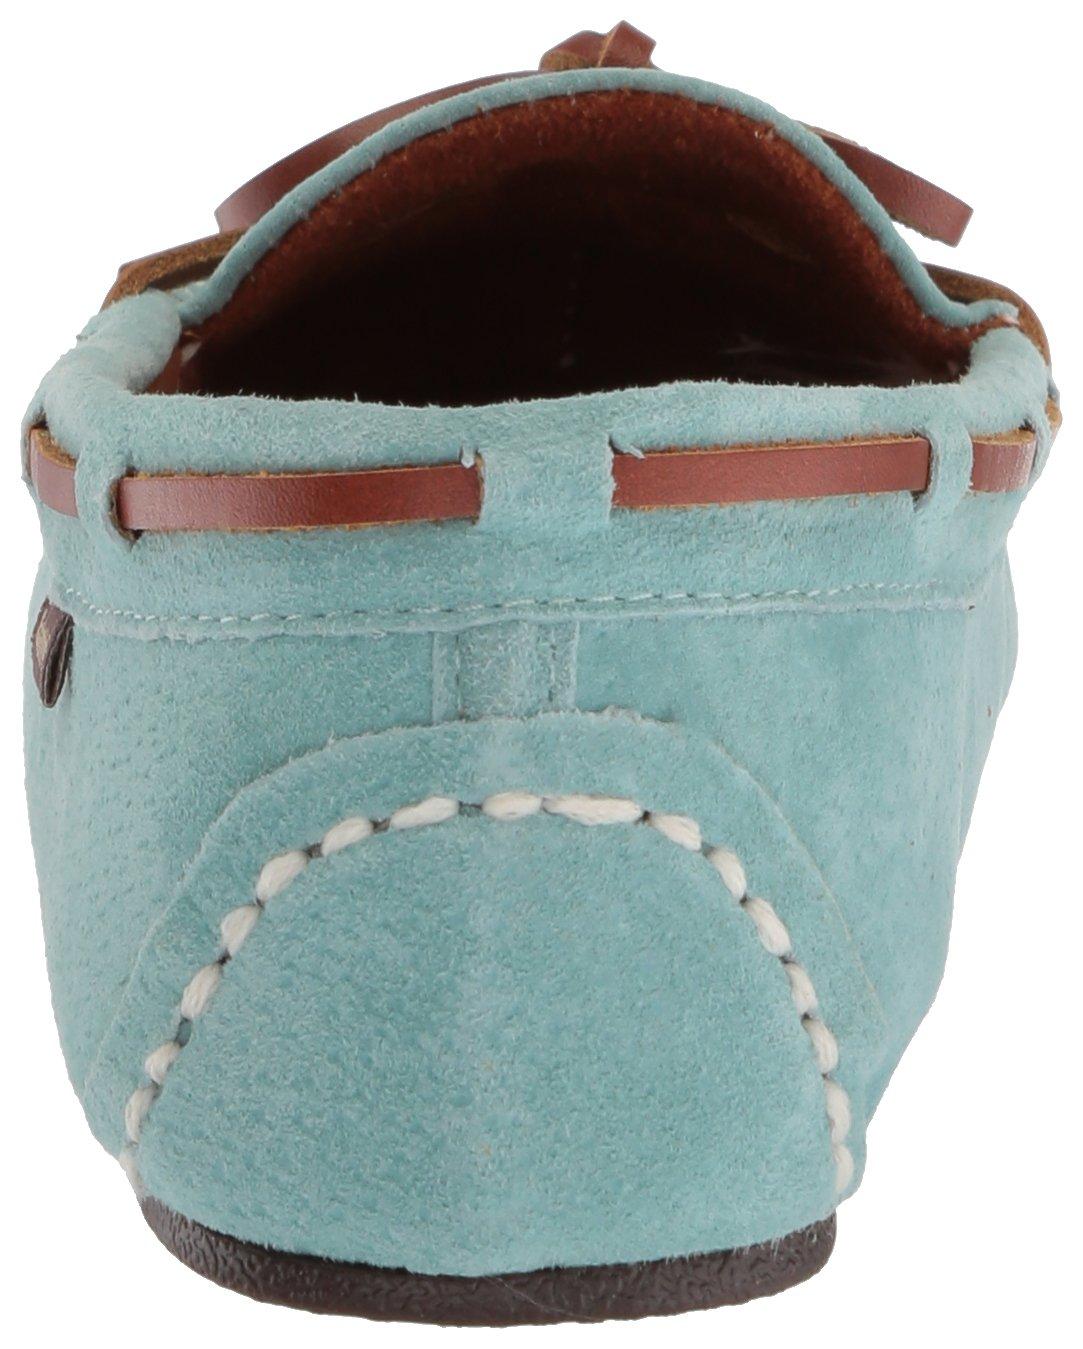 Lamo Women's B01KMWTSYY Sabrina Moc II Shoe, Moccasin, Chestnut B01KMWTSYY Women's 7.5 B(M) US|Mint 8a28d1